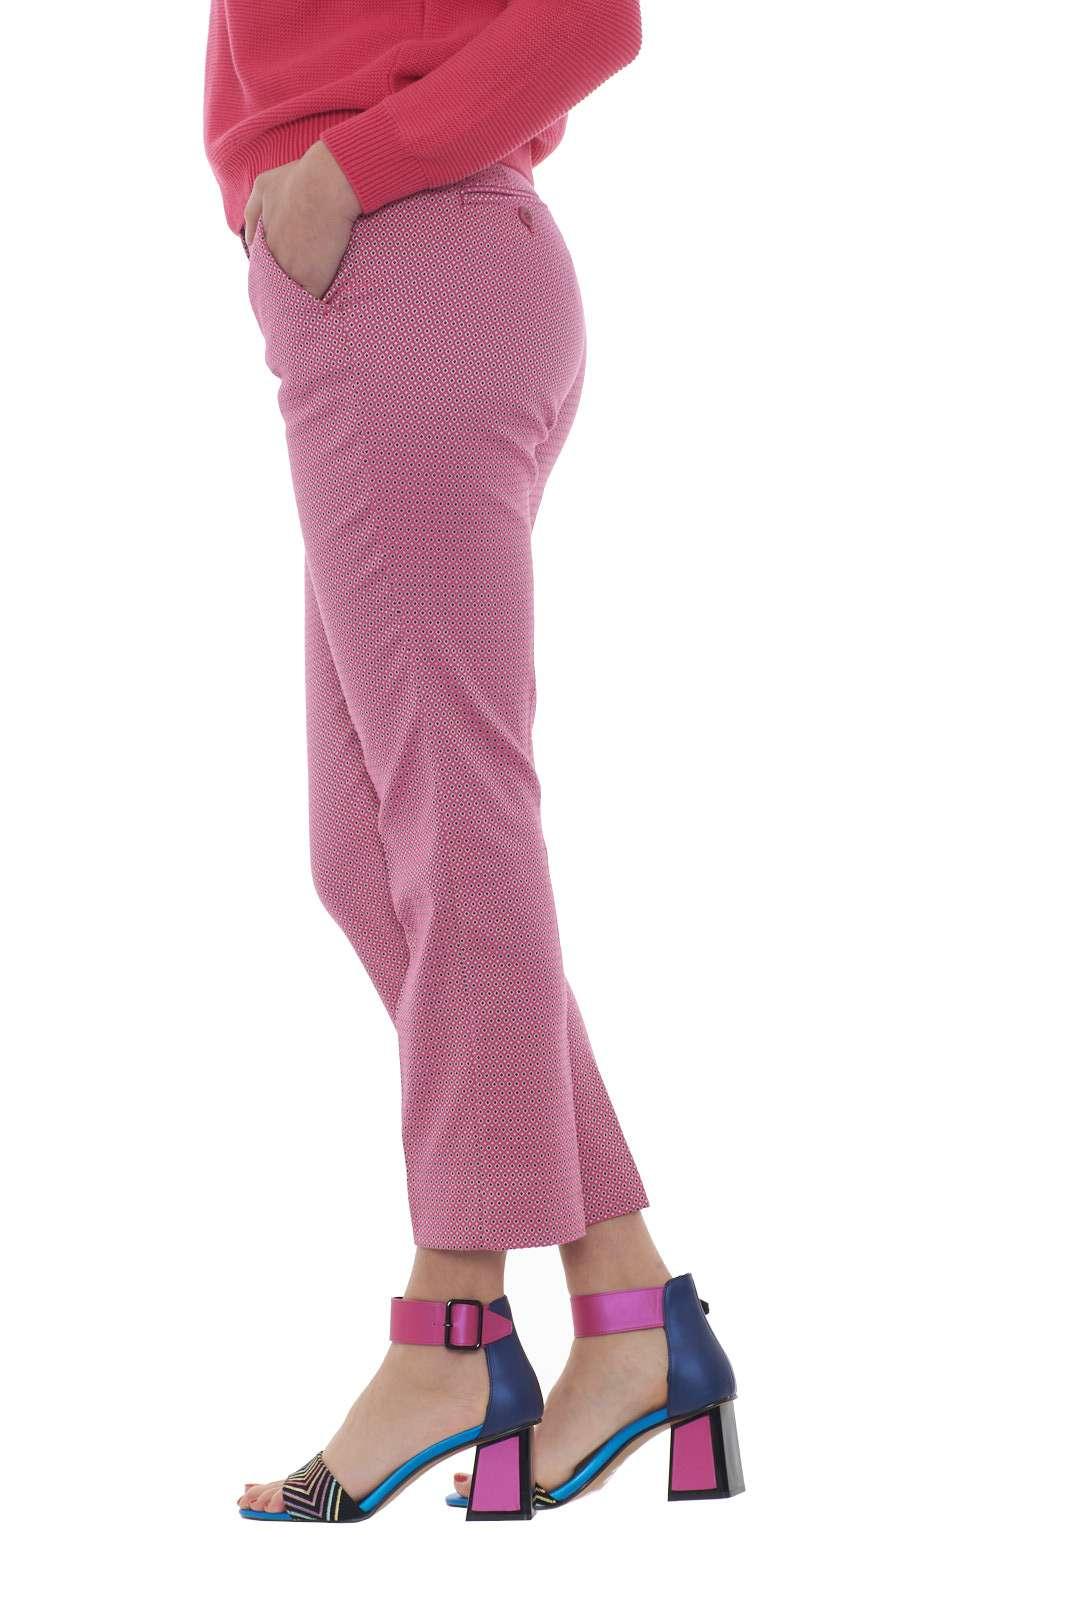 https://www.parmax.com/media/catalog/product/a/i/PE-outlet_parmax-pantaloni-donna-MaxMara-51310207-B.jpg